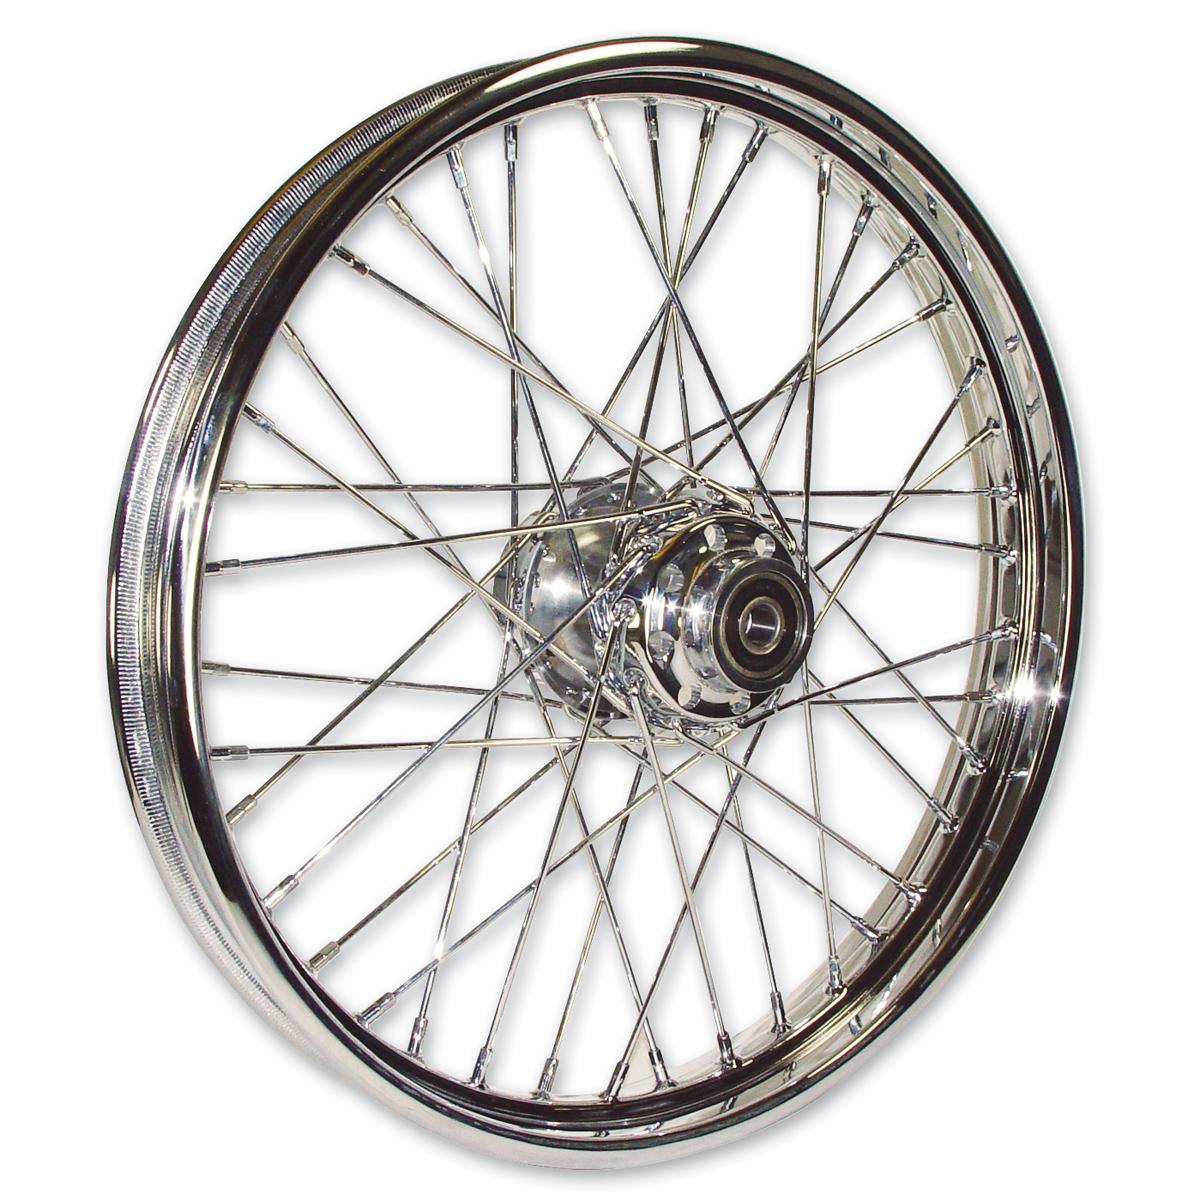 "Mid-USA Chrome Complete 40 Spoke Front Wheel 19 X 2.5"""